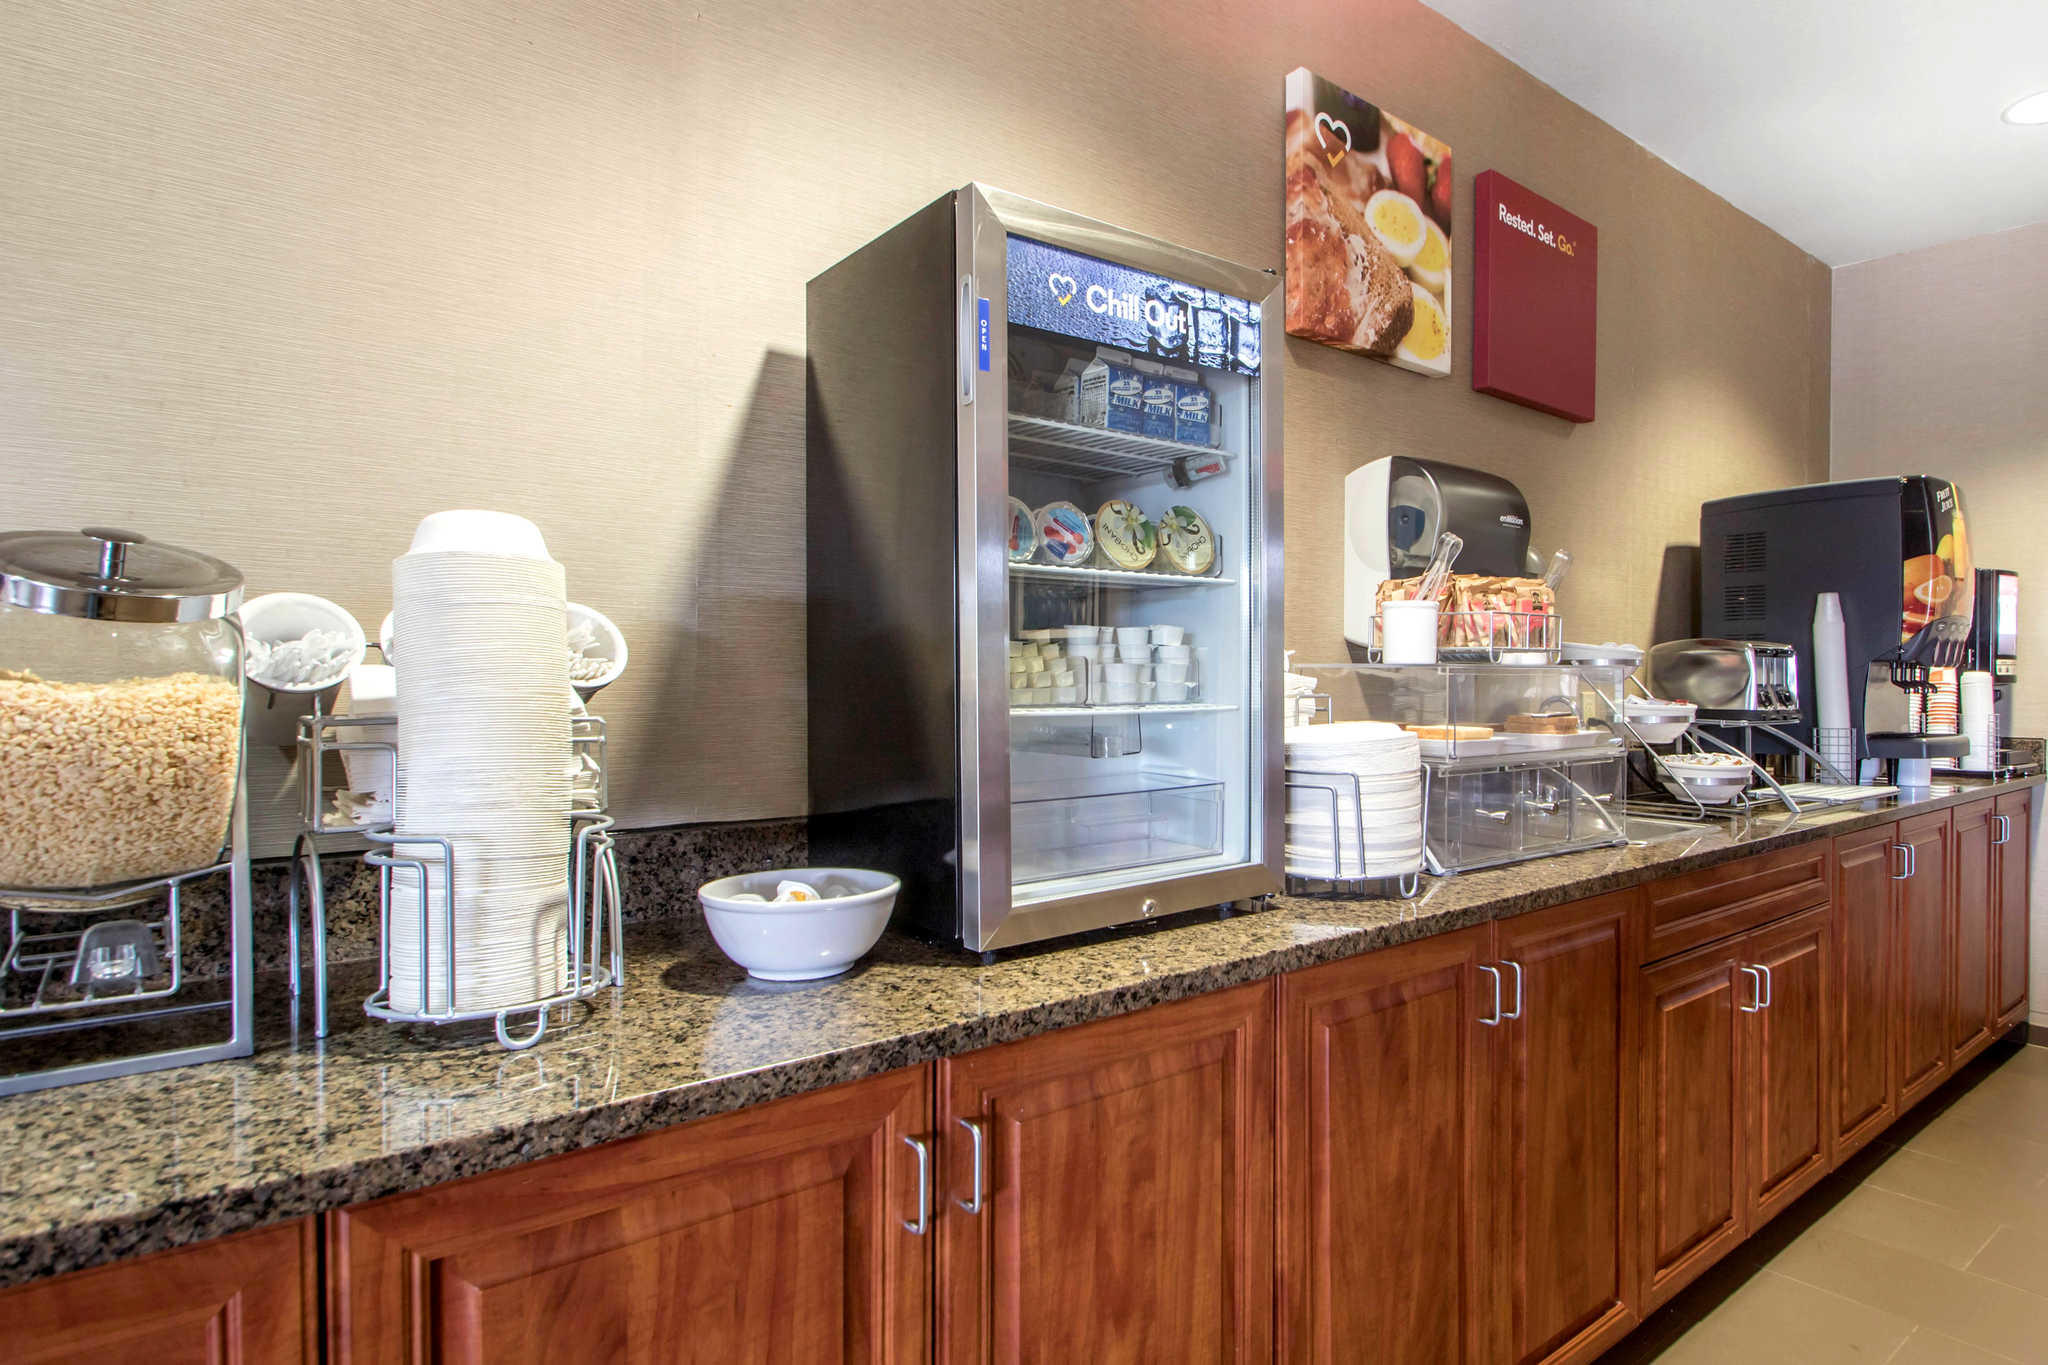 Comfort Suites Johnson Creek Conference Center image 22